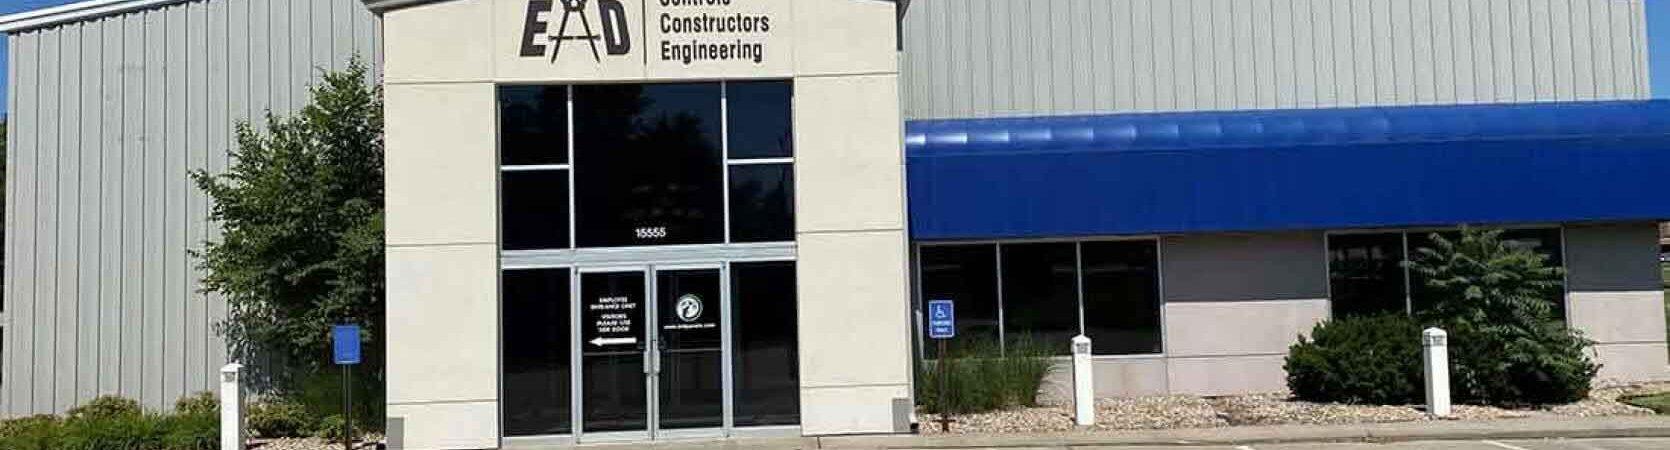 EAD Corporate Building 2 for control panel design